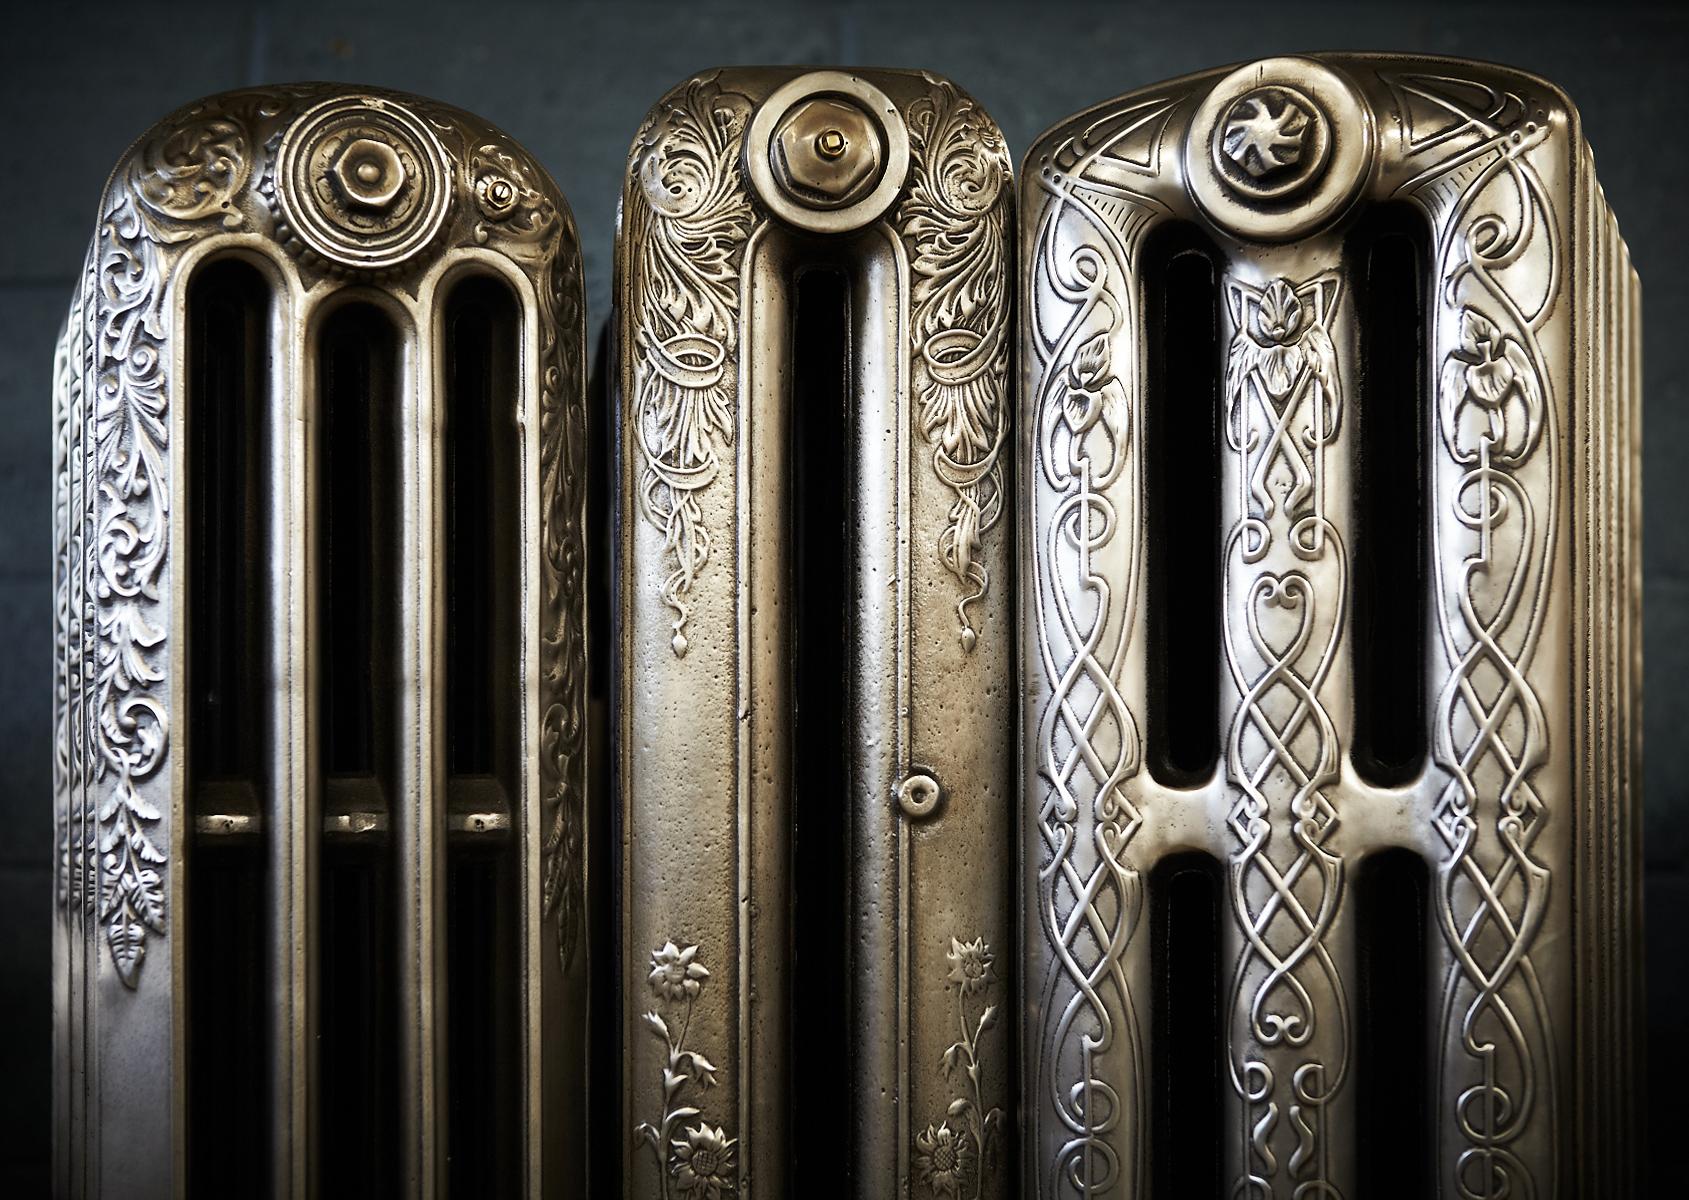 Old Cast Iron Radiators